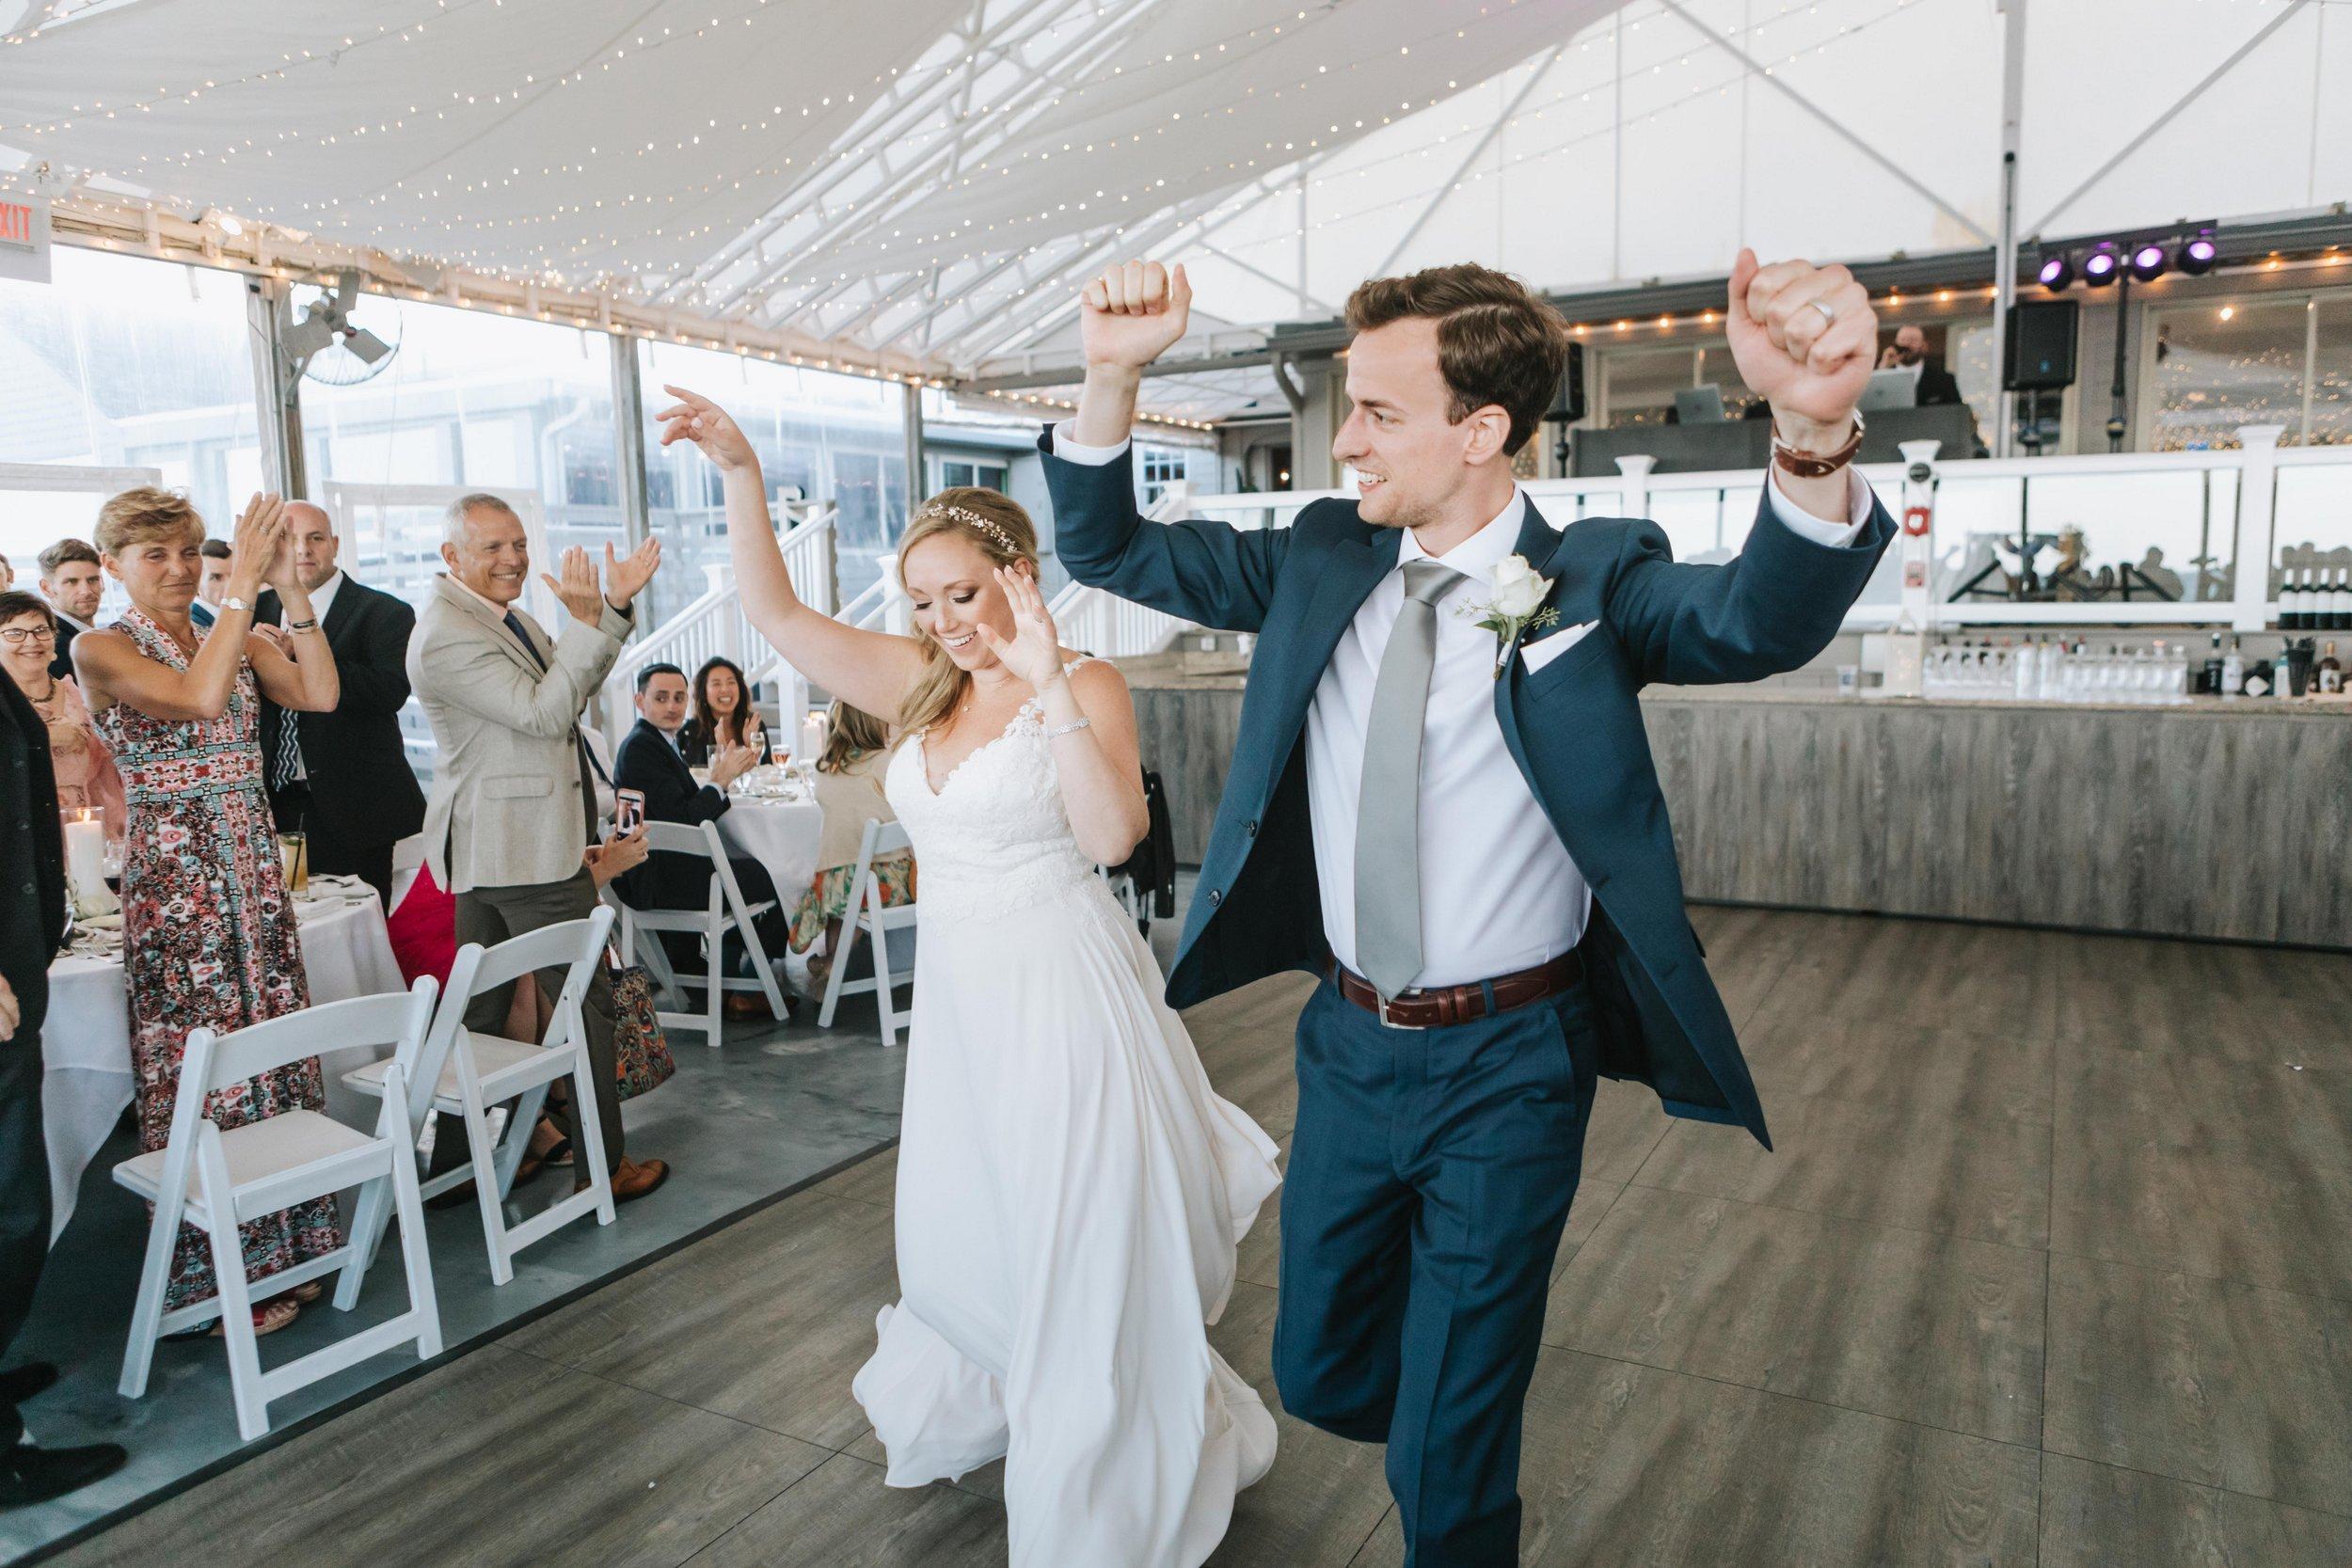 Popponesset-Inn-Wedding-Cape-Cod-Lena-Mirisola-Photography-41.jpg